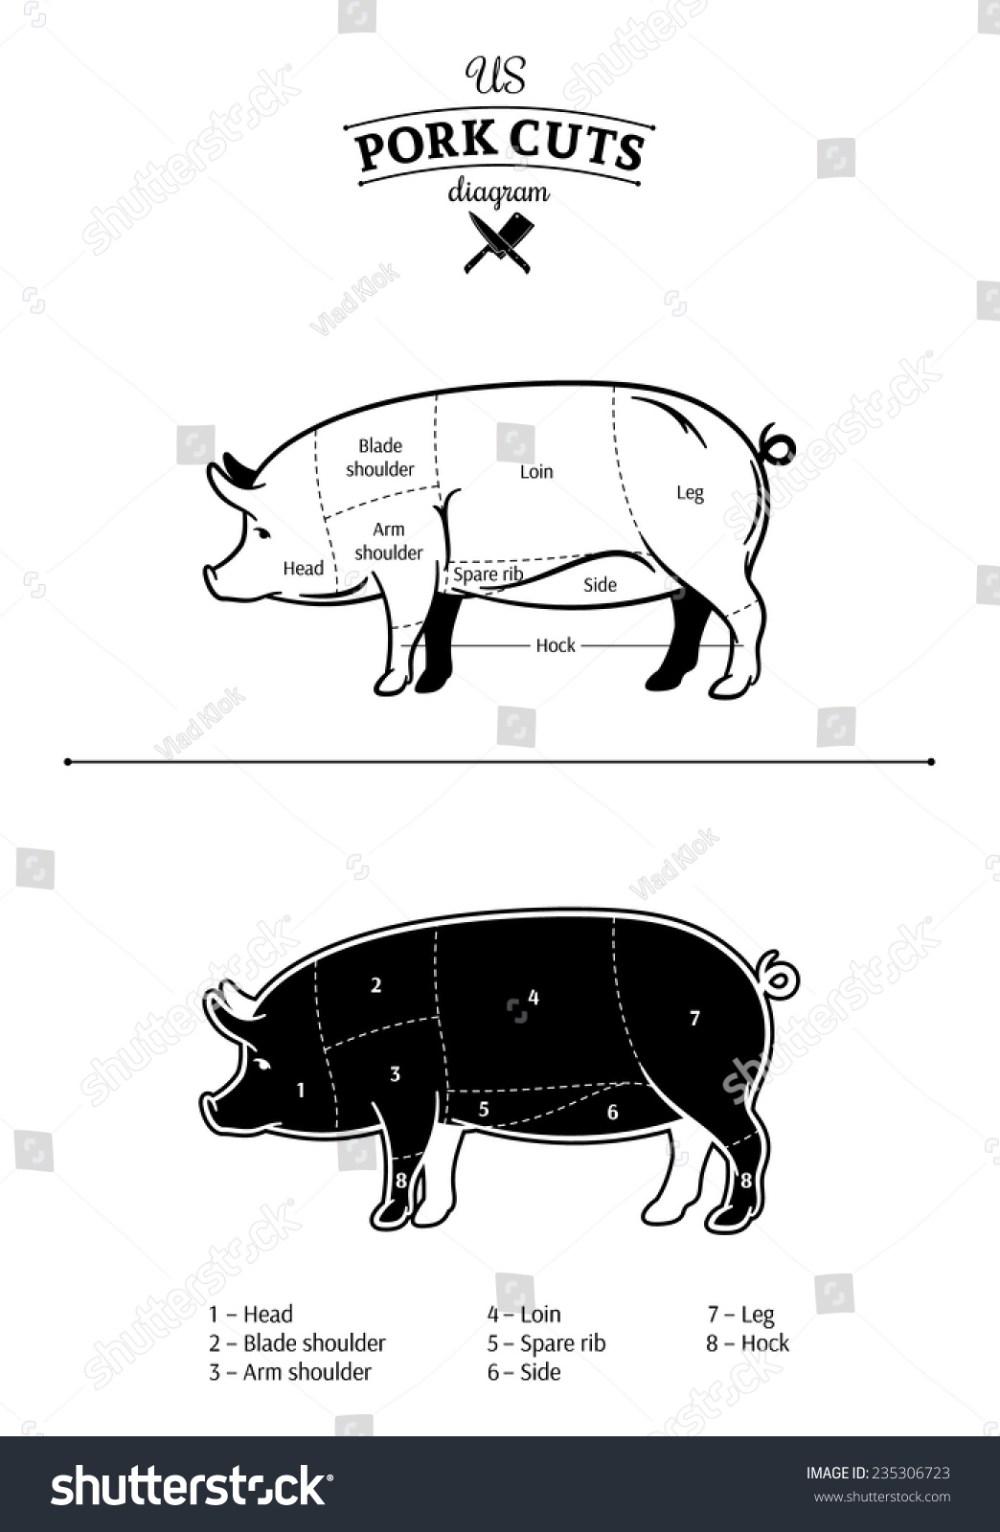 medium resolution of pig arm diagram wiring diagram log pig arm diagram